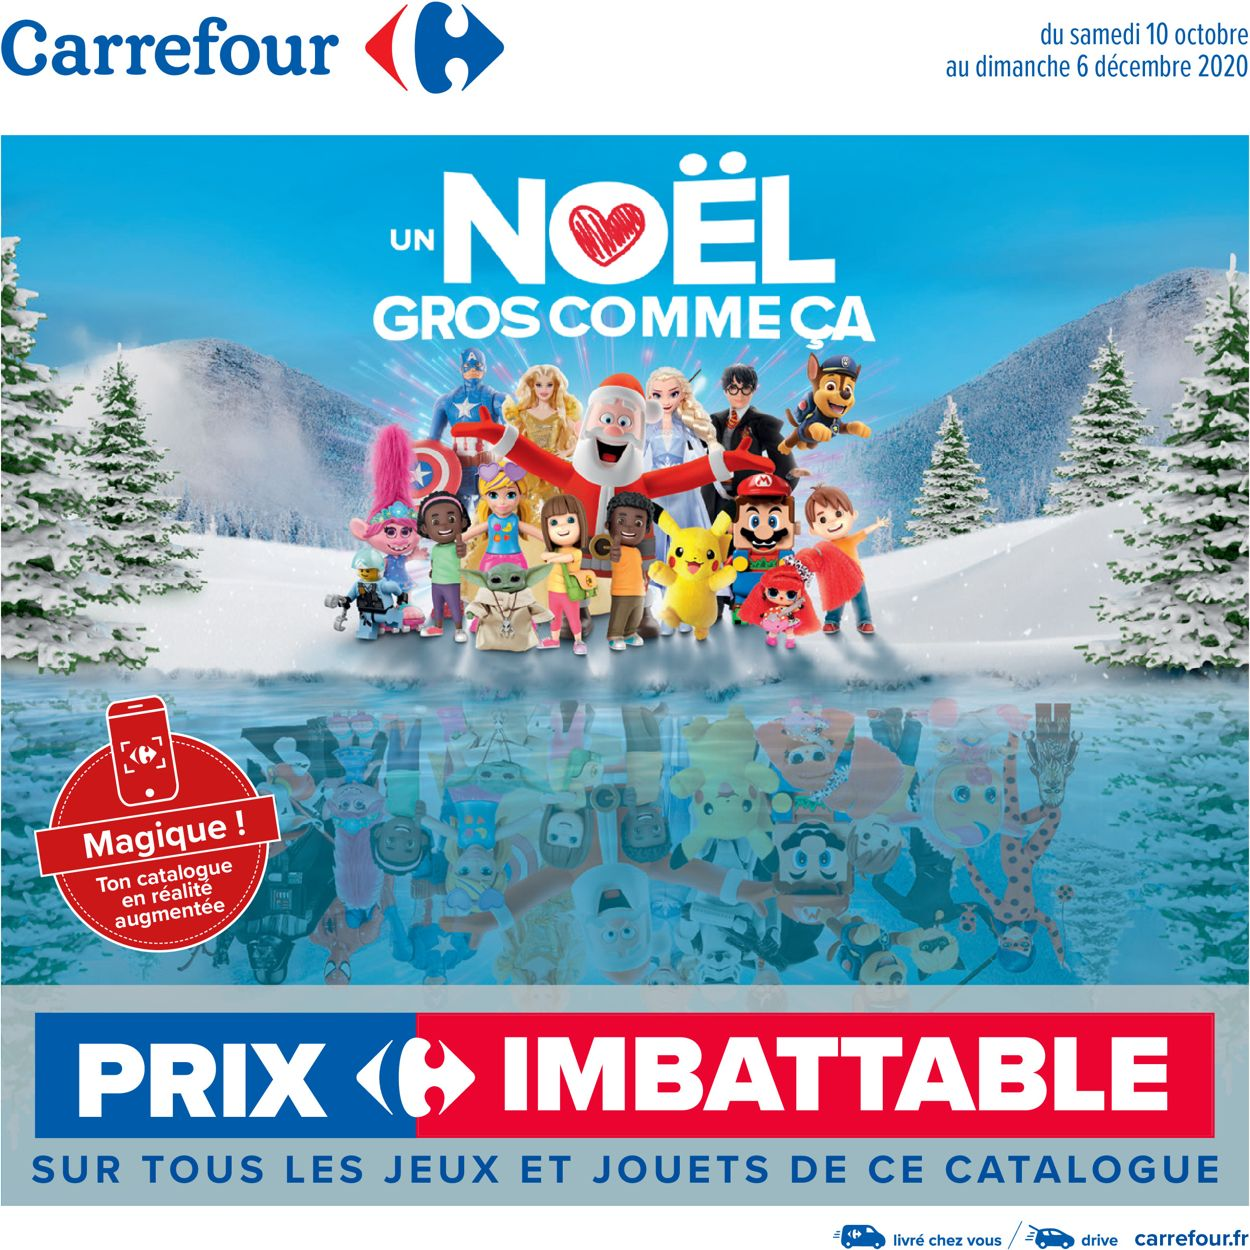 Carrefour Noel 2020 Catalogue - 10.10-06.12.2020